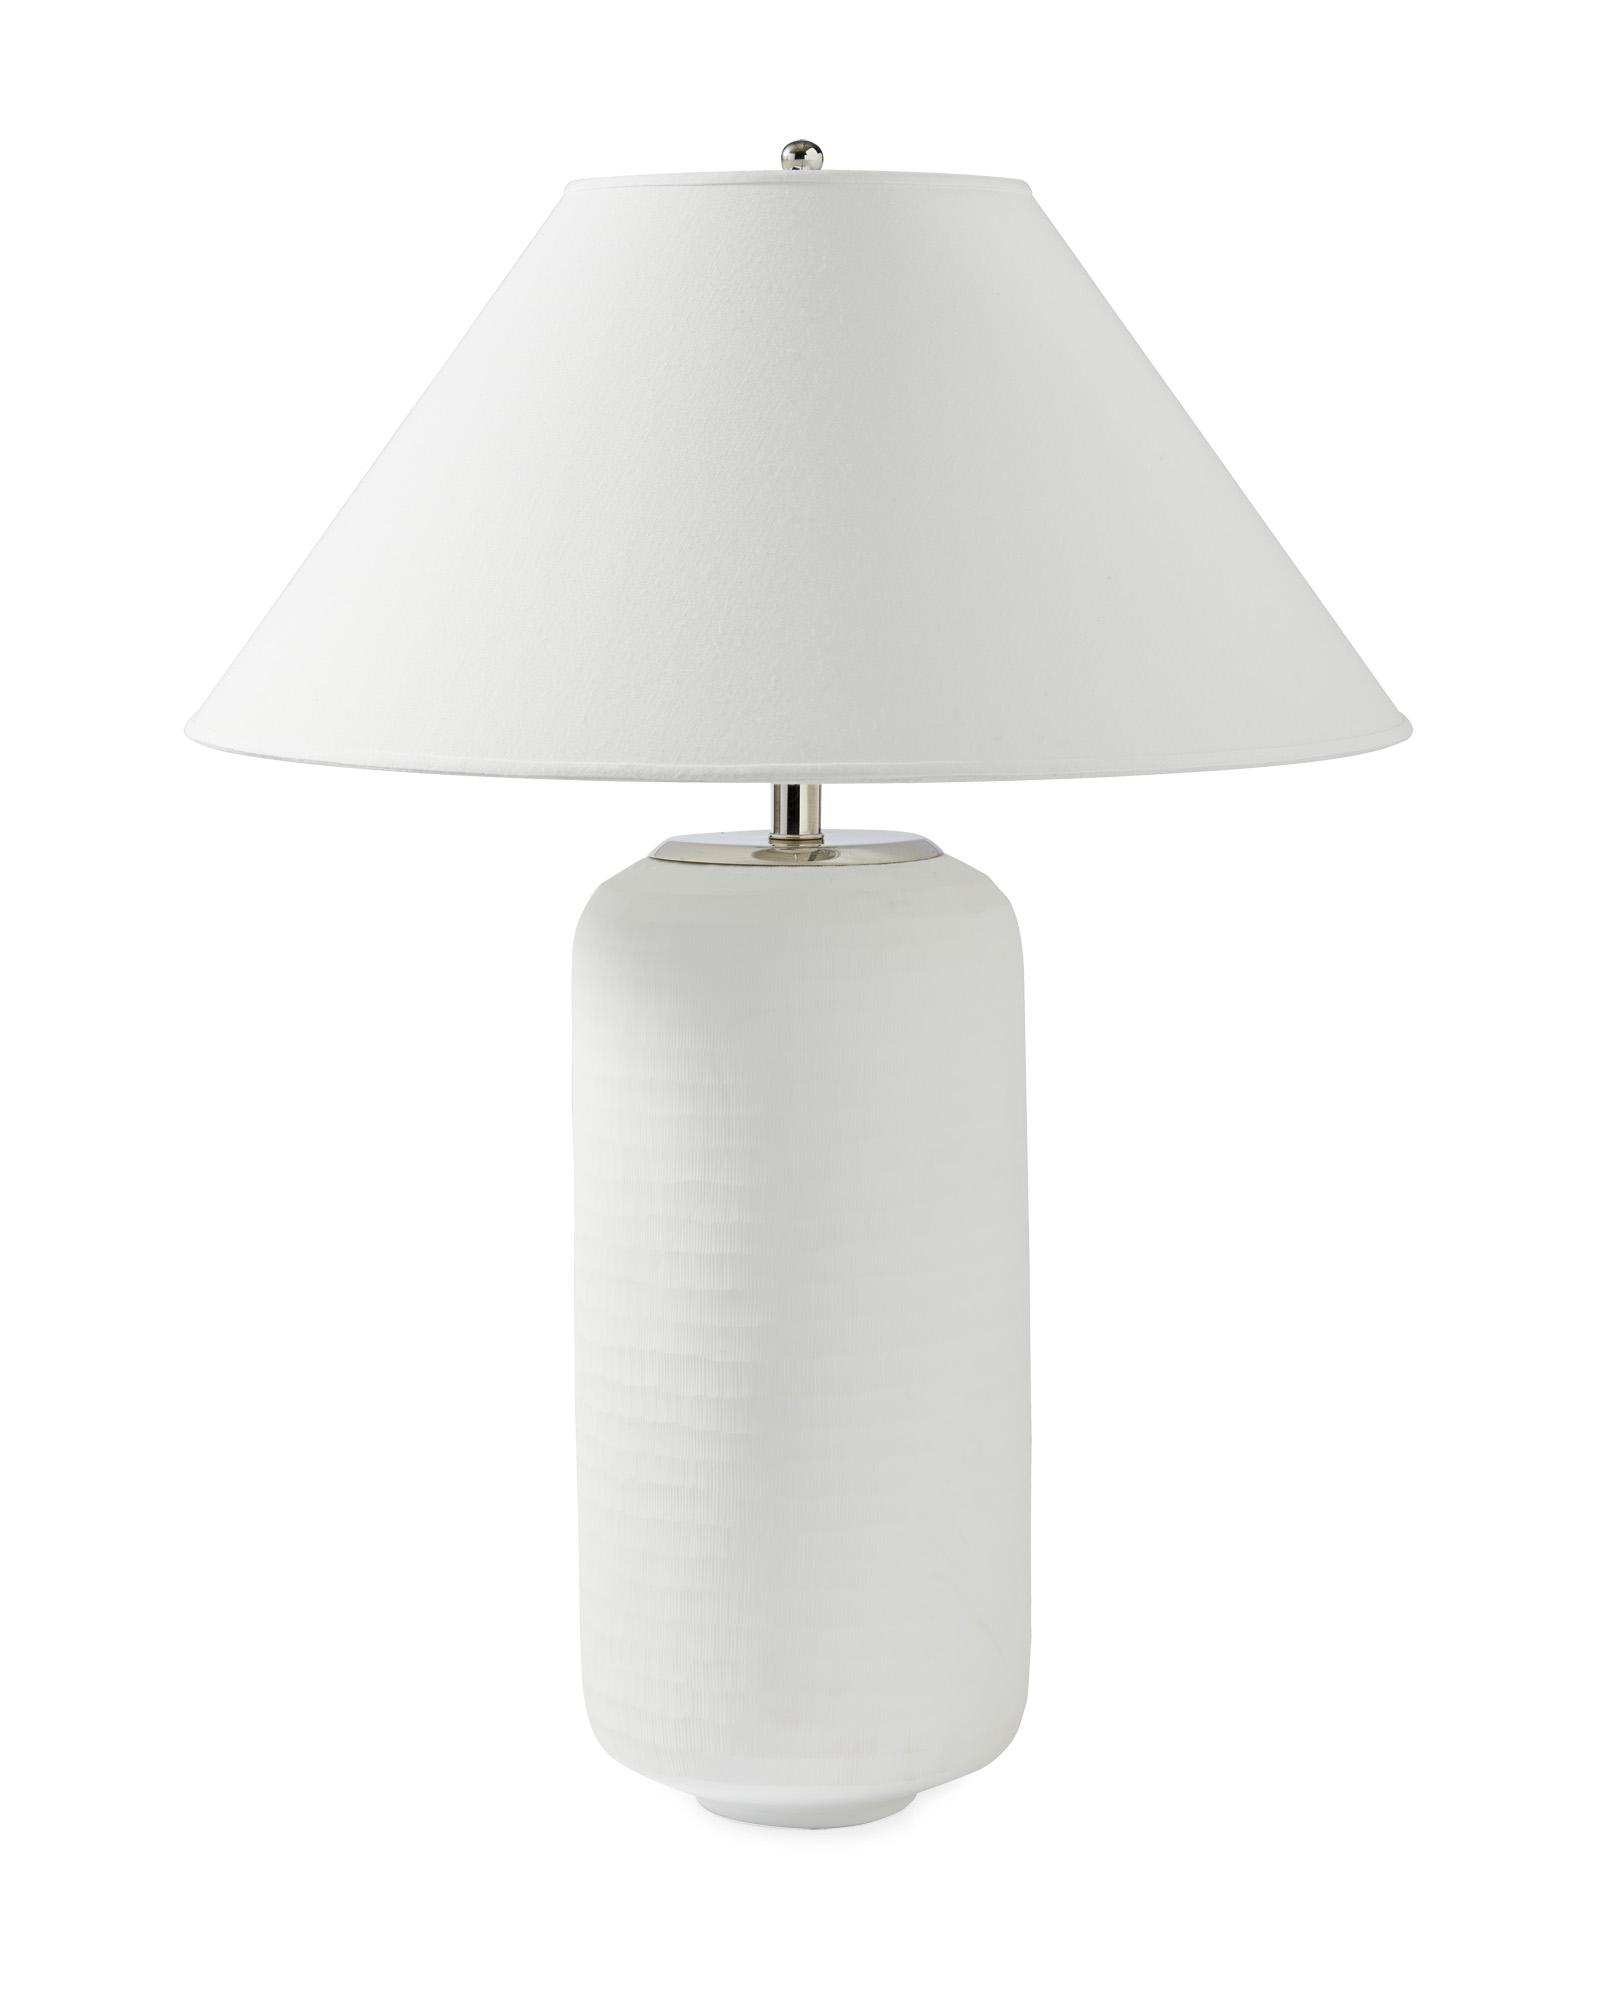 Lighting_Calypso_Table_Lamp_Large_MV_Crop_SH.jpg